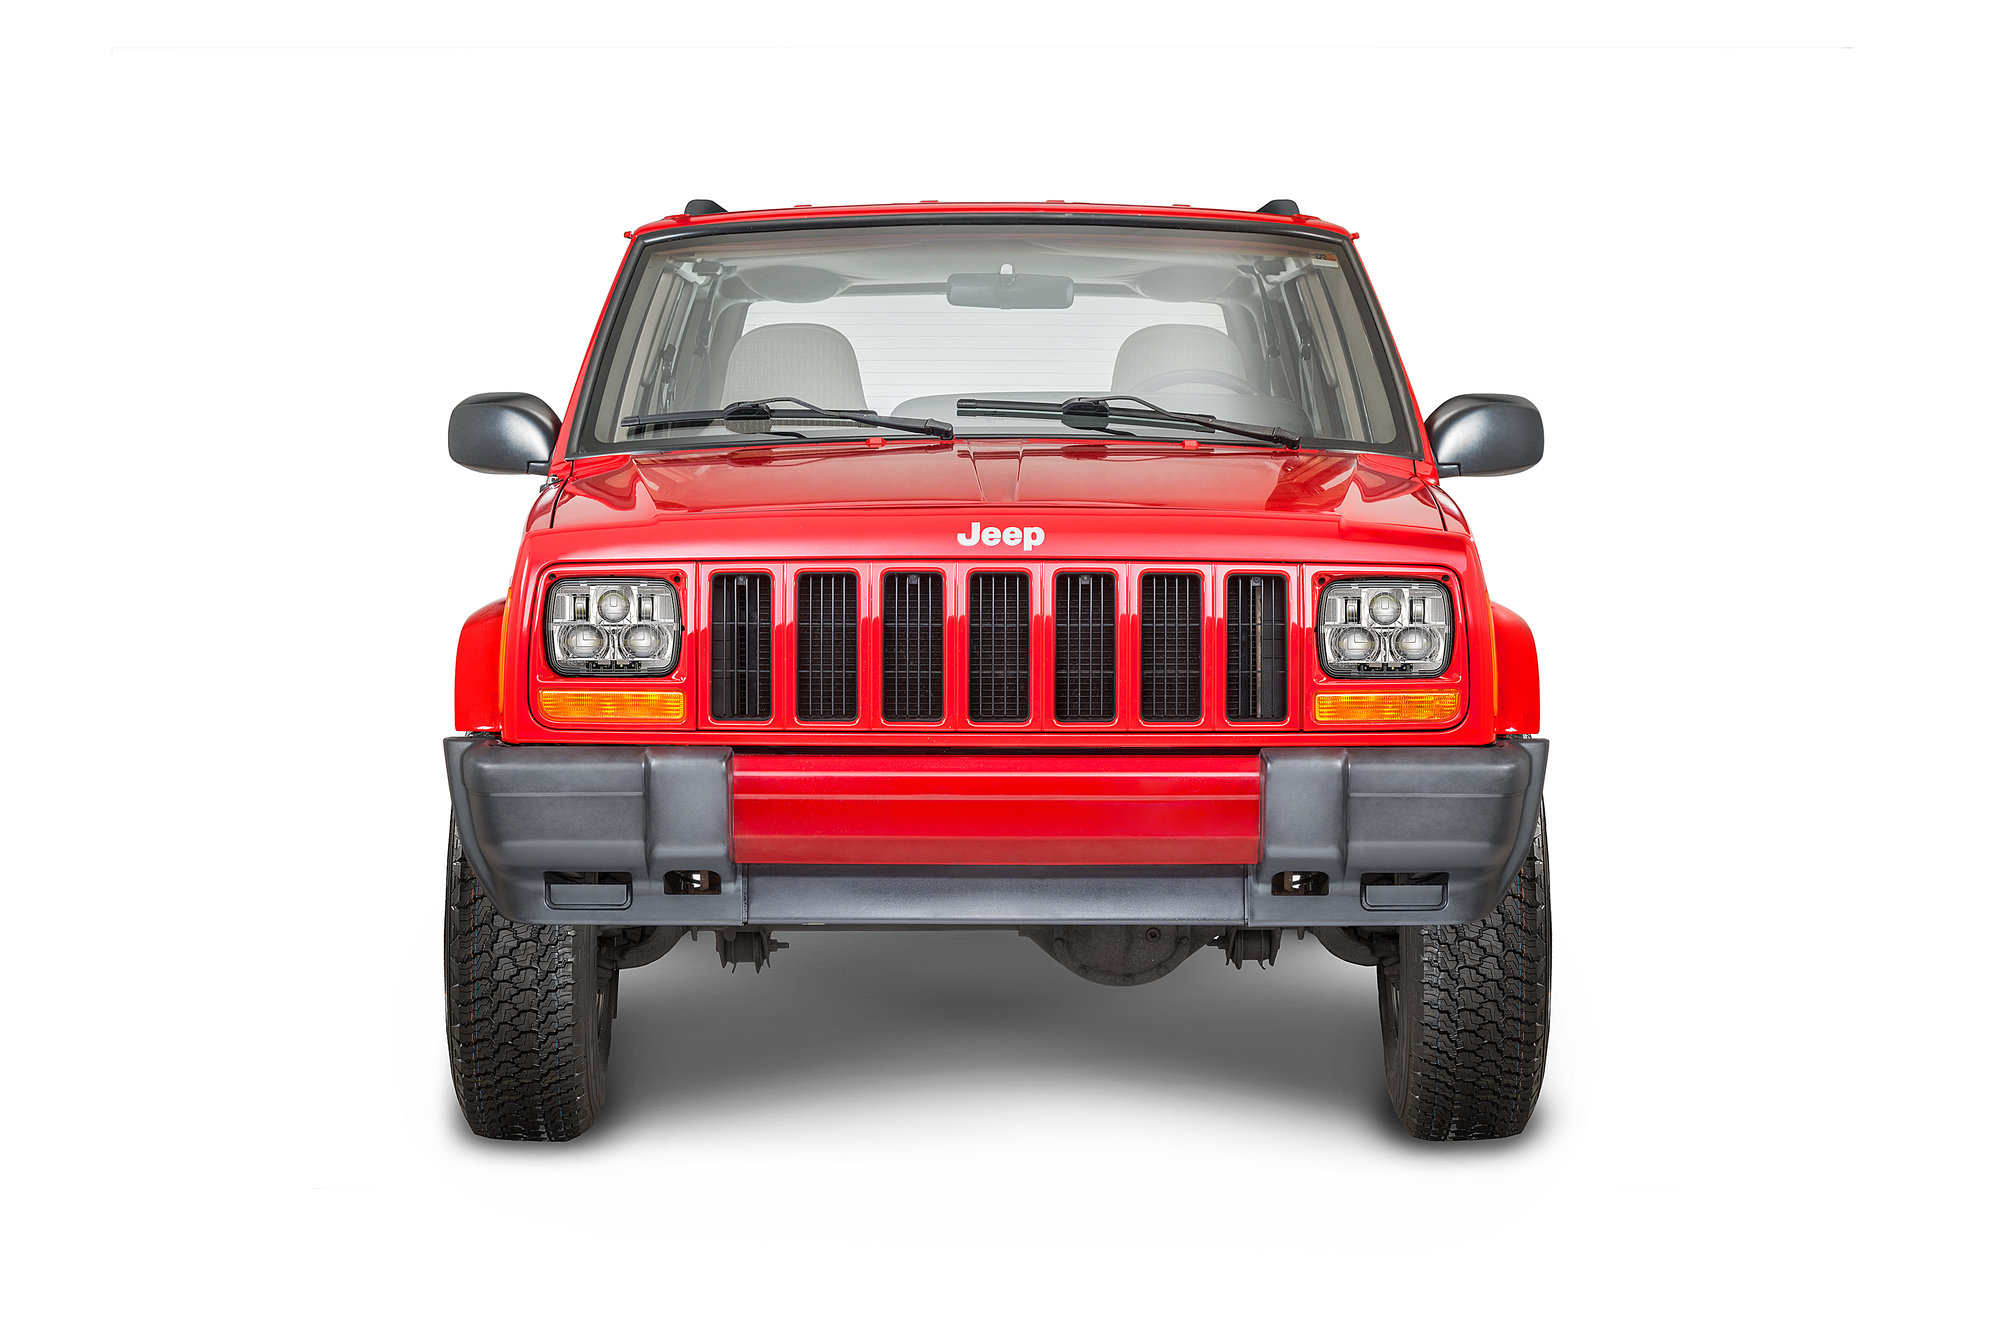 hight resolution of jeep xj halo headlights wiring wiring diagram schematic jeep cherokee xj halo headlights on 92 jeep